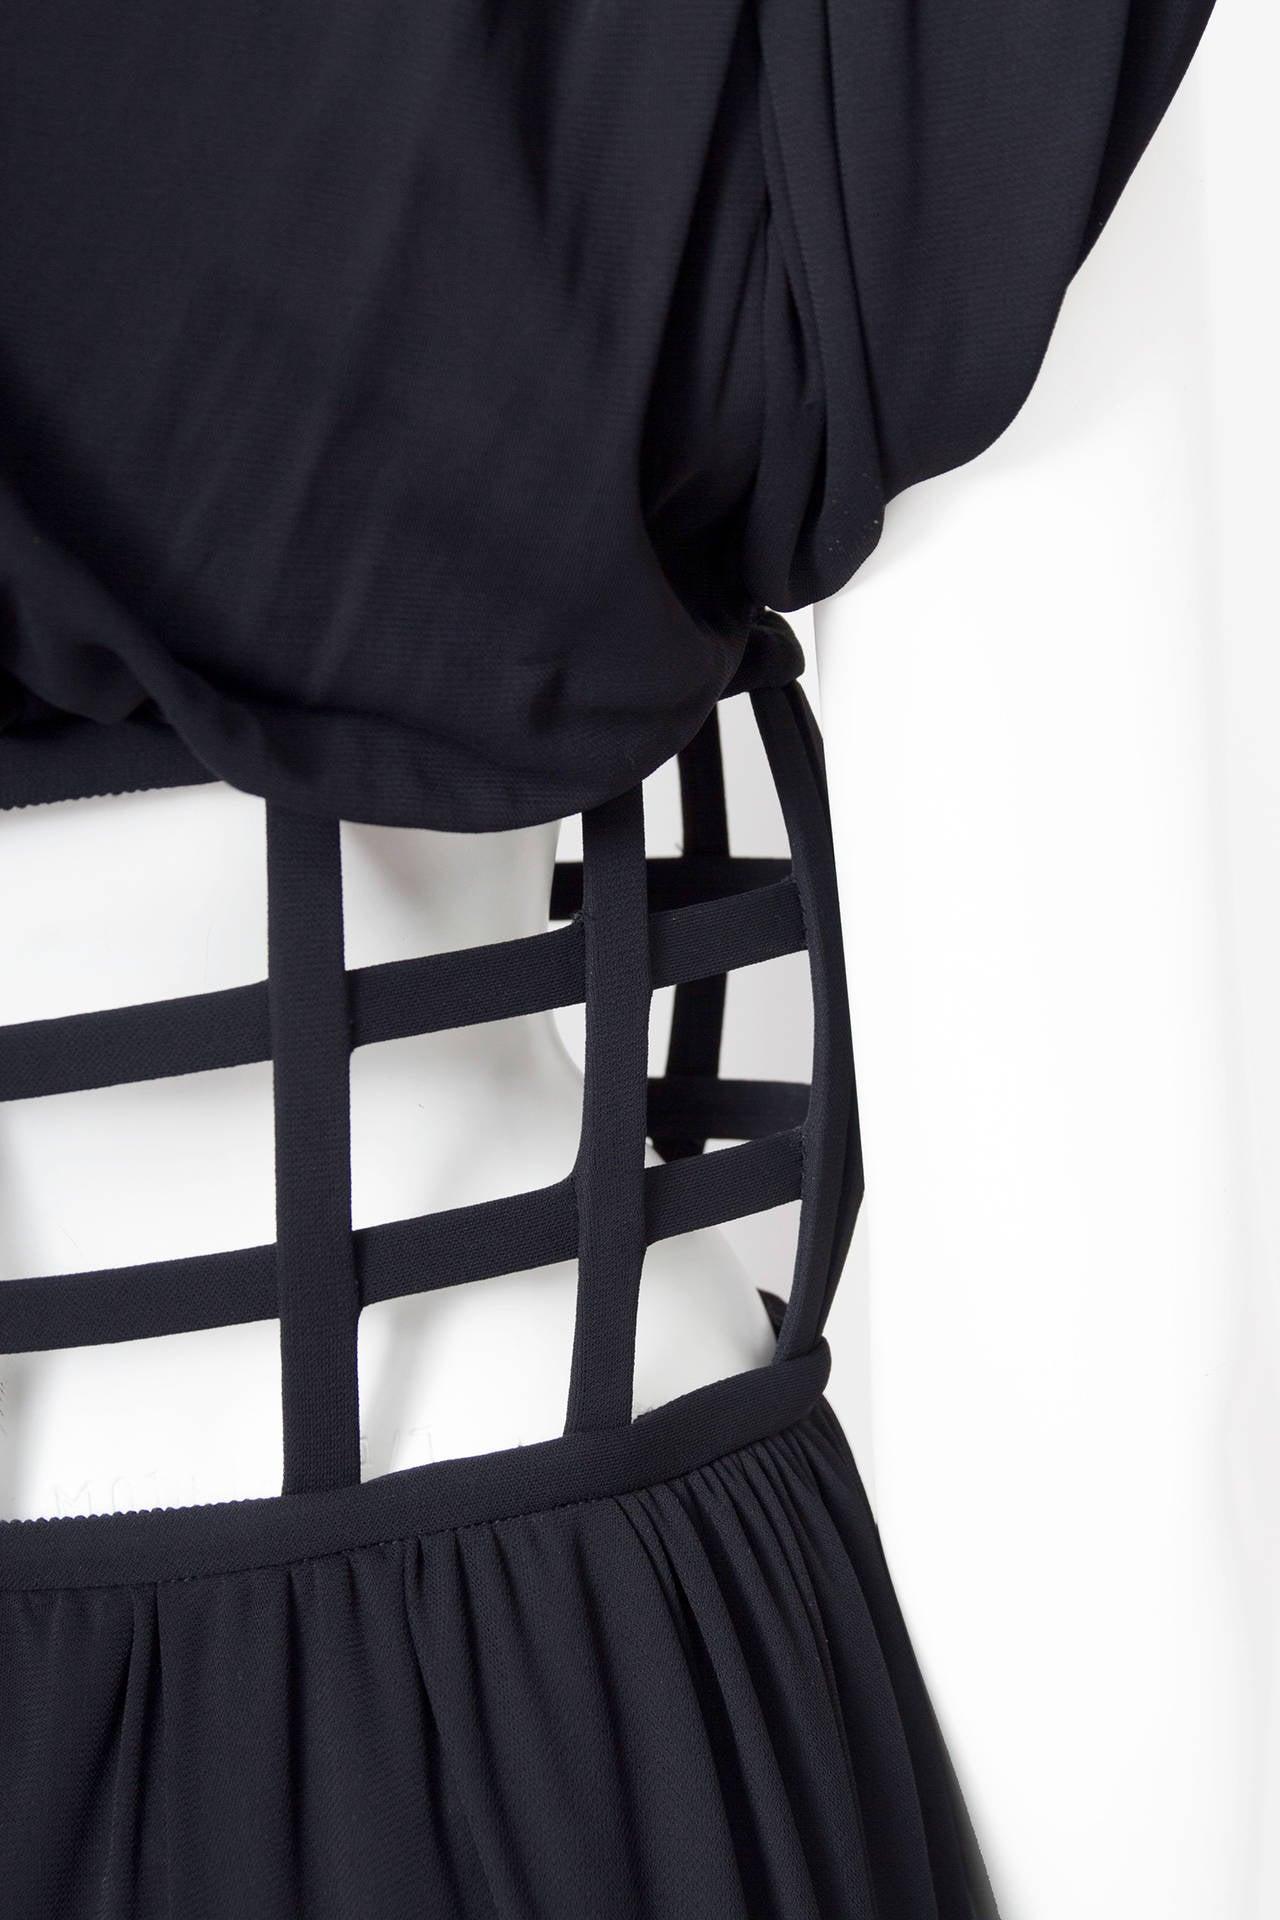 1990s Jean Paul Gaultier Black Corset Dress 8